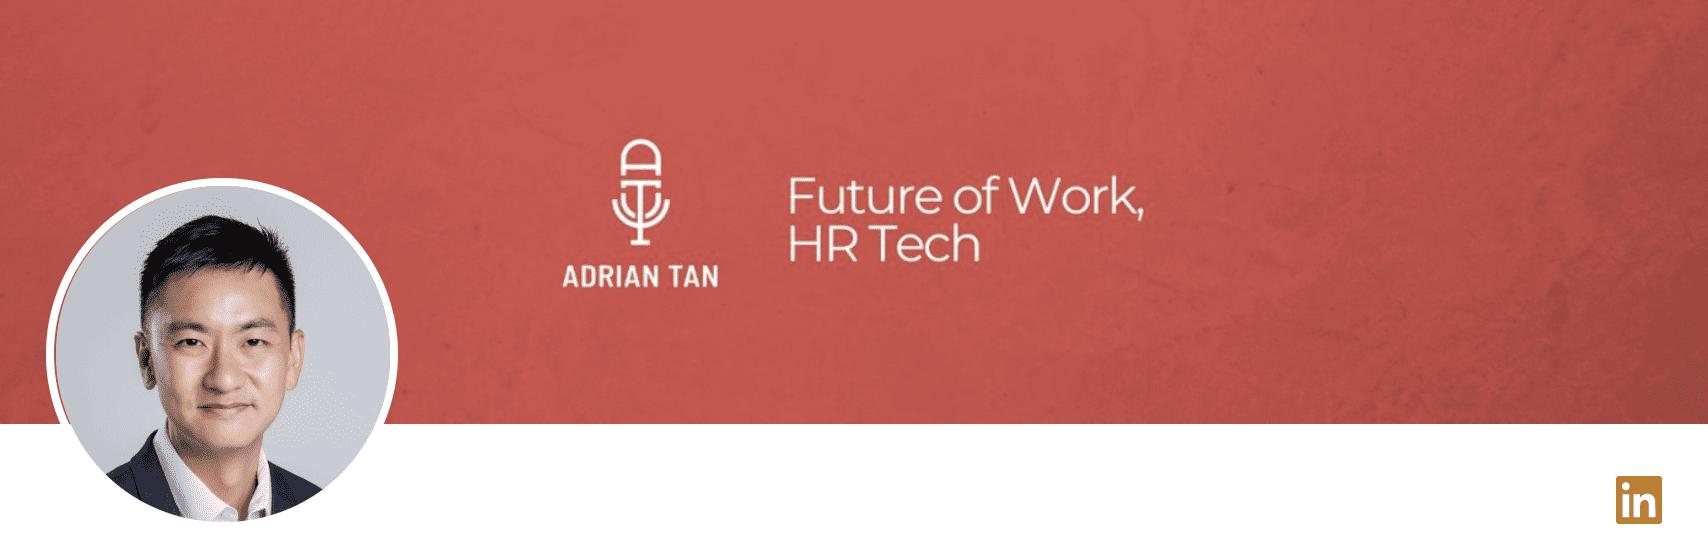 Grove HR - HR influencers - Adrian Tan